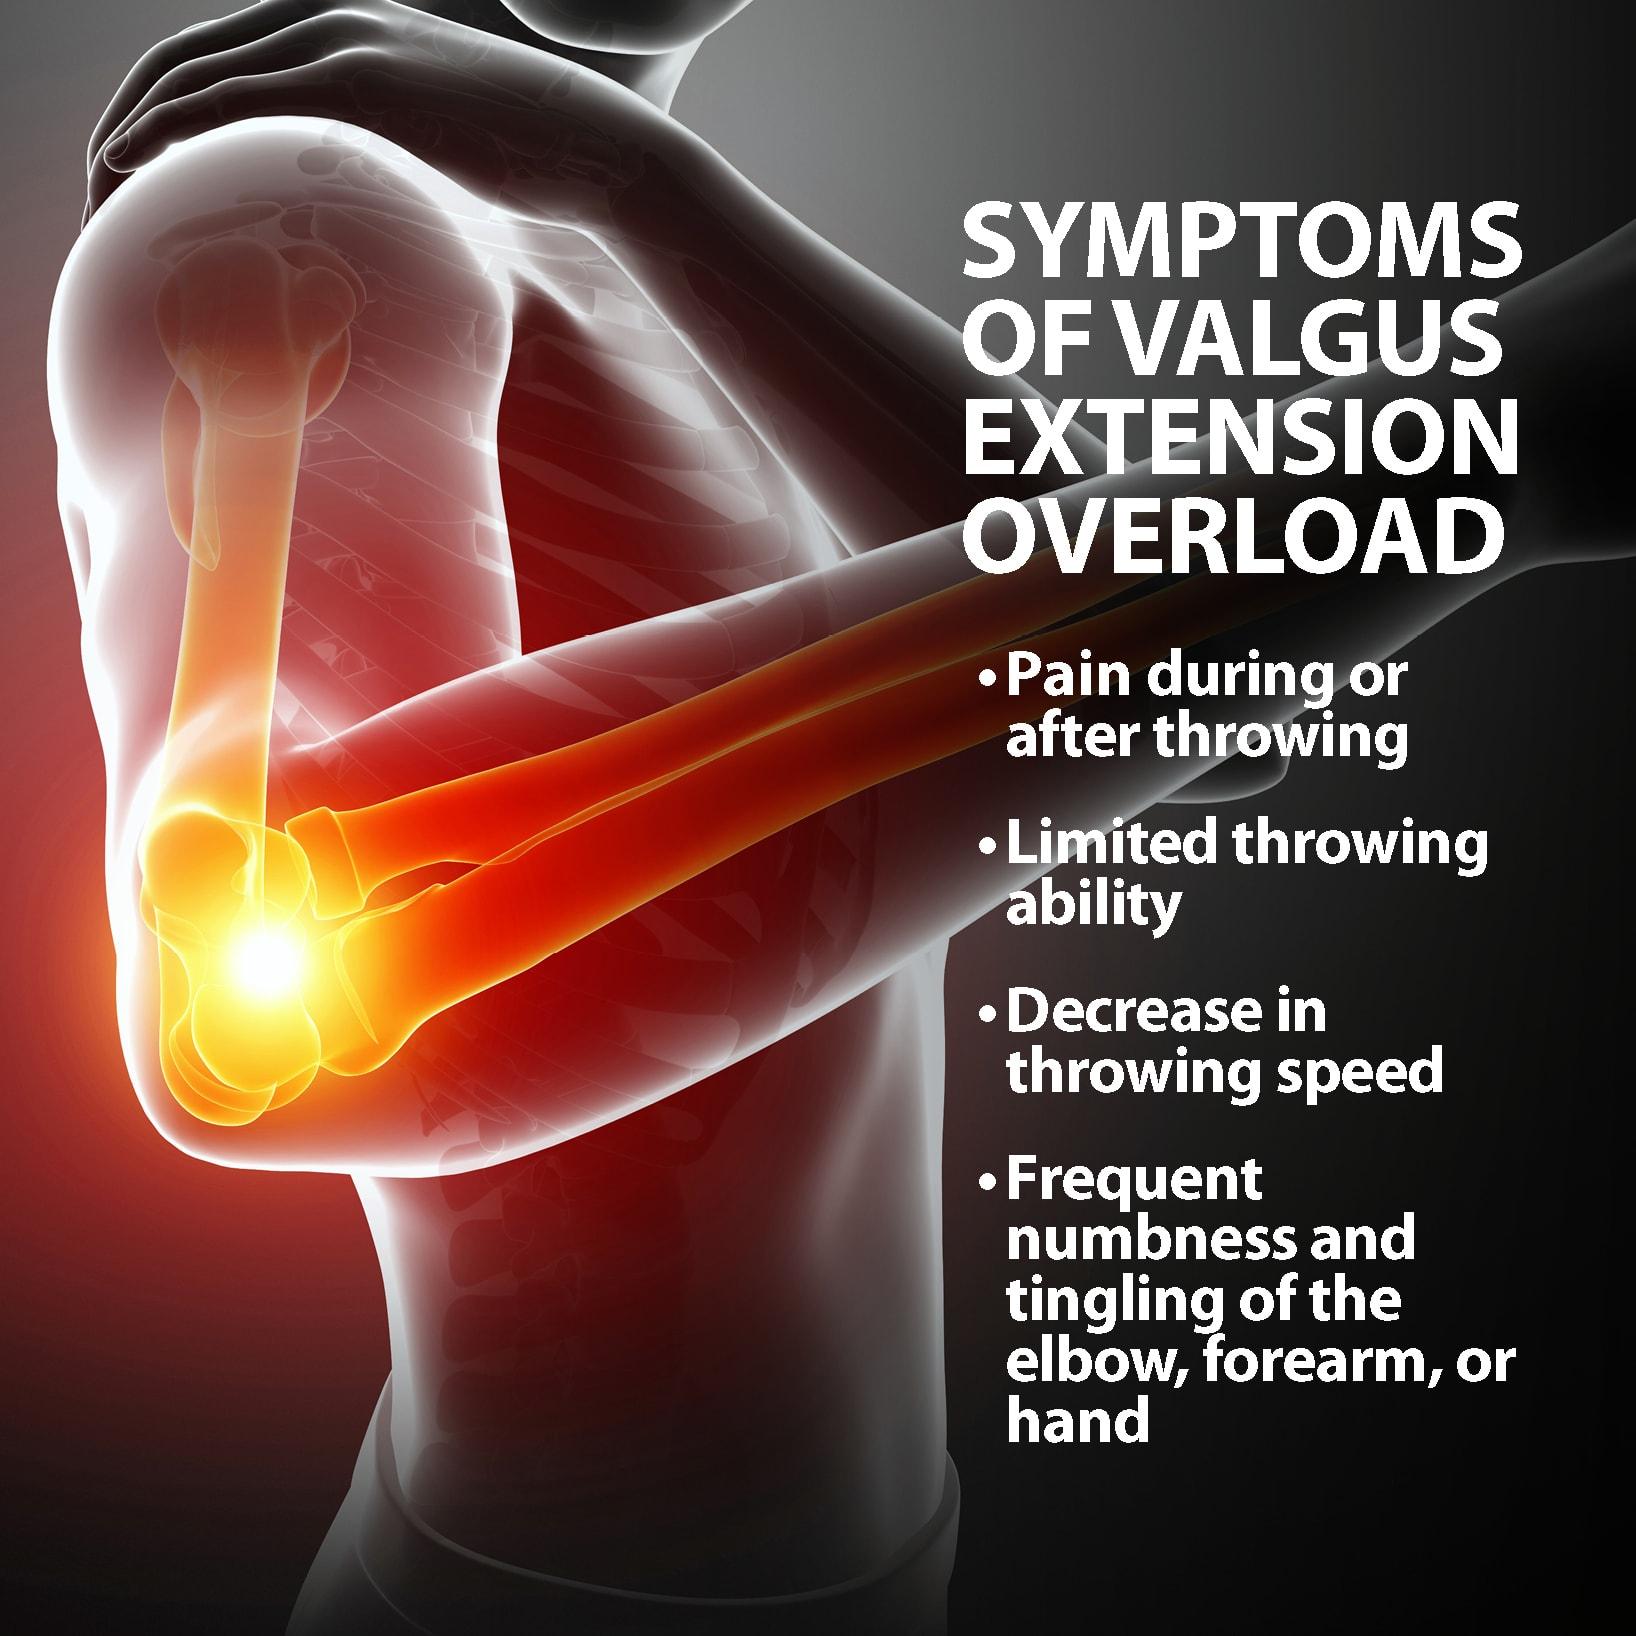 Valgus Extension Overload Symptoms